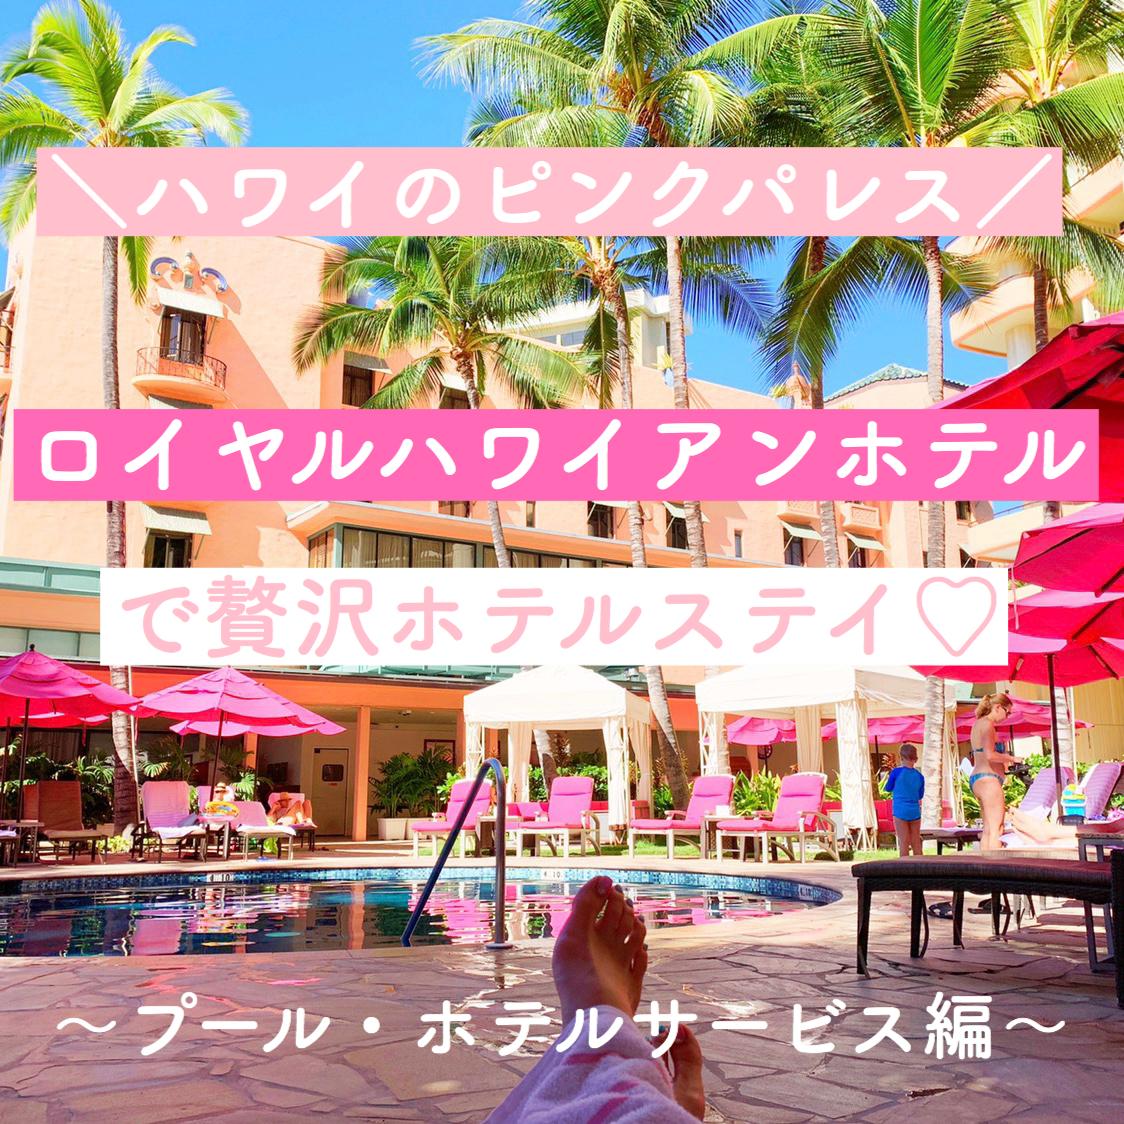 【Part3】「ロイヤル ハワイアン ホテル」で贅沢ステイ【プール・ホテルサービス】